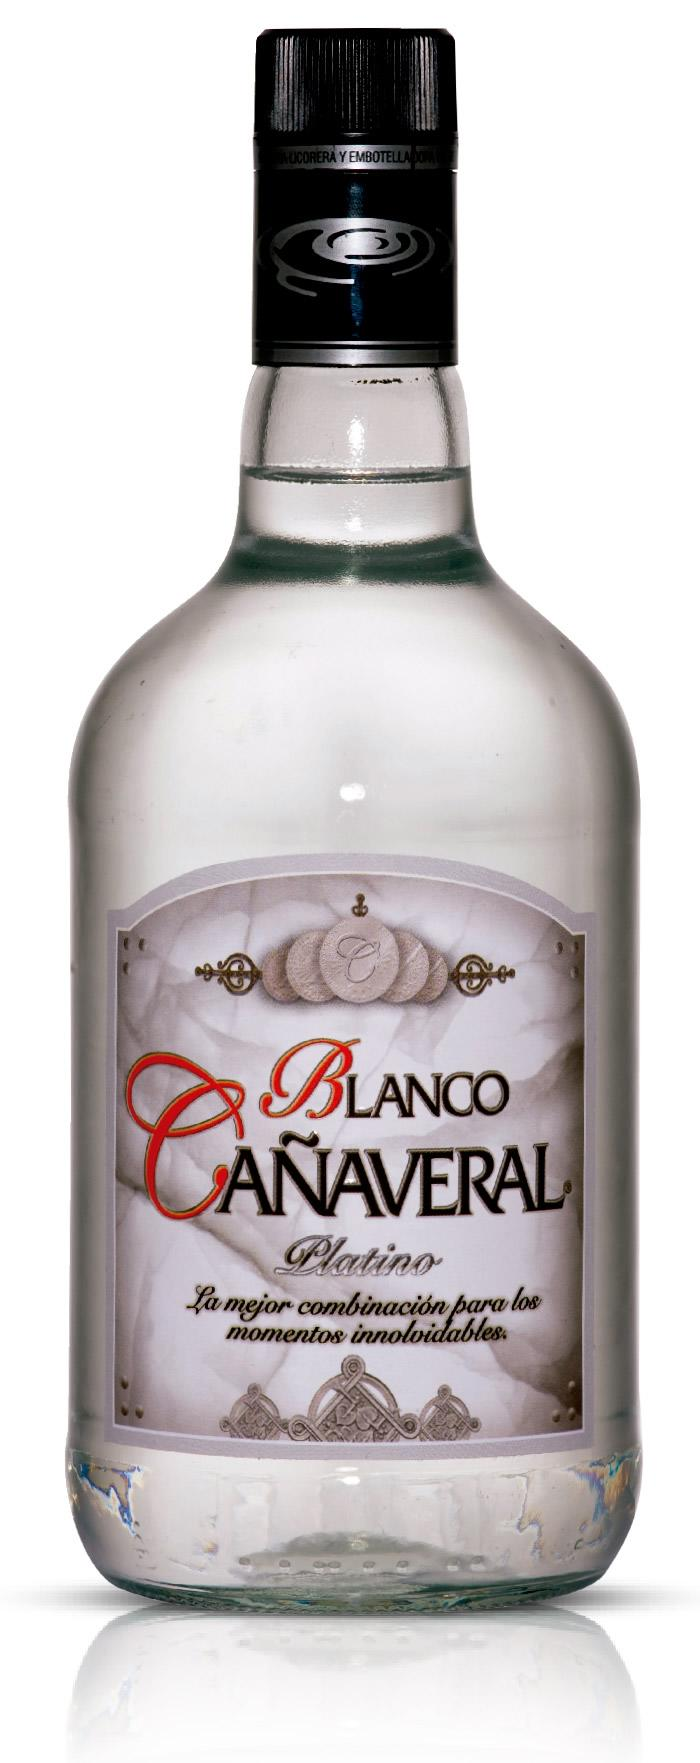 bblancocanaveral